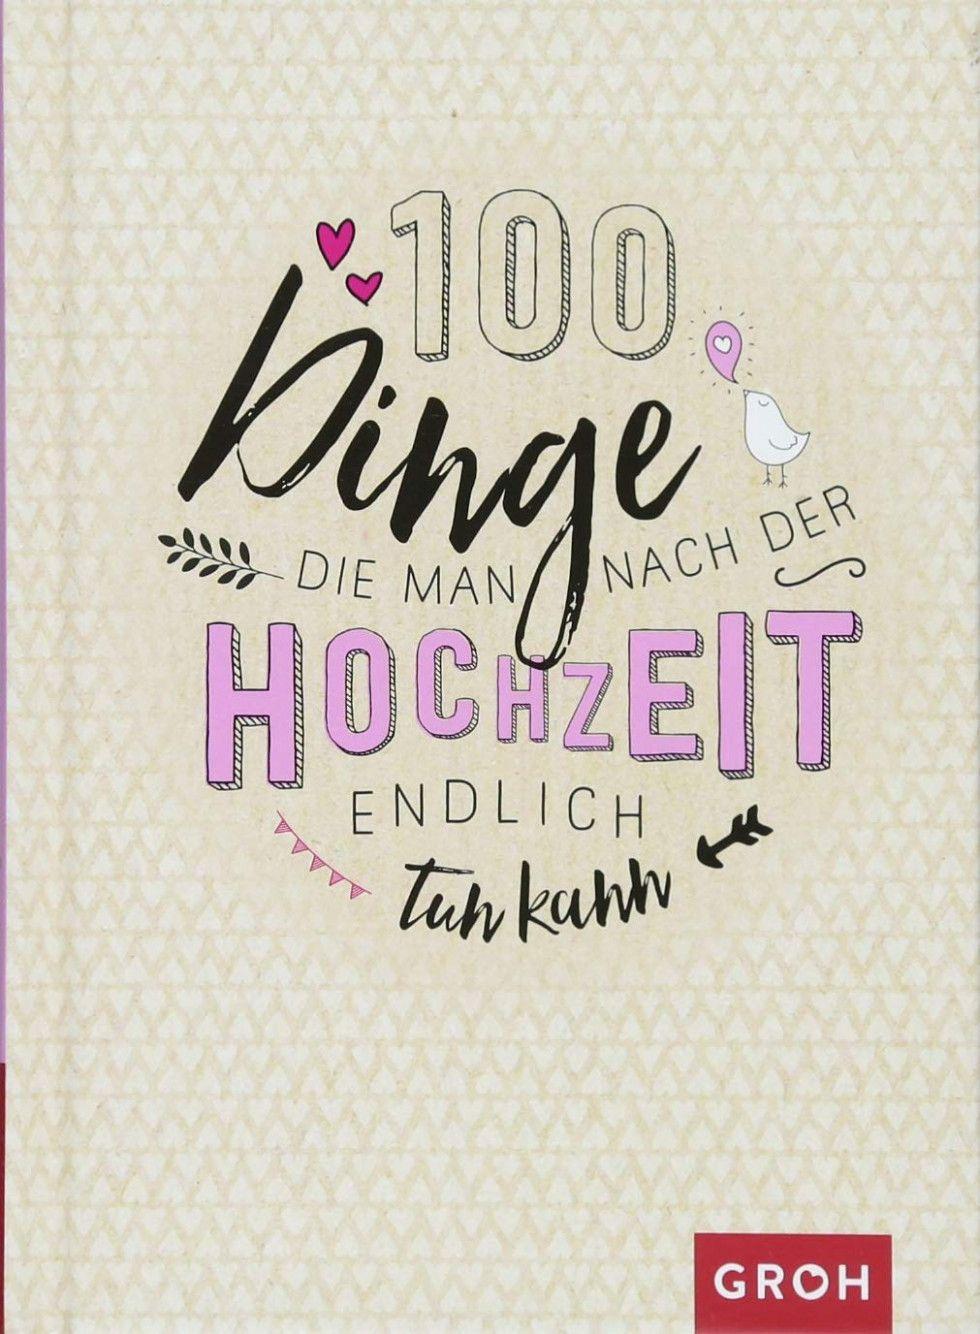 Romantische Verse Zur Hochzeit The Server Is Temporarily Busy Try Again Later Romantische Verse Zur Hochzeit Ro In 2020 Hardcover Book 100 Things To Do Book Cover